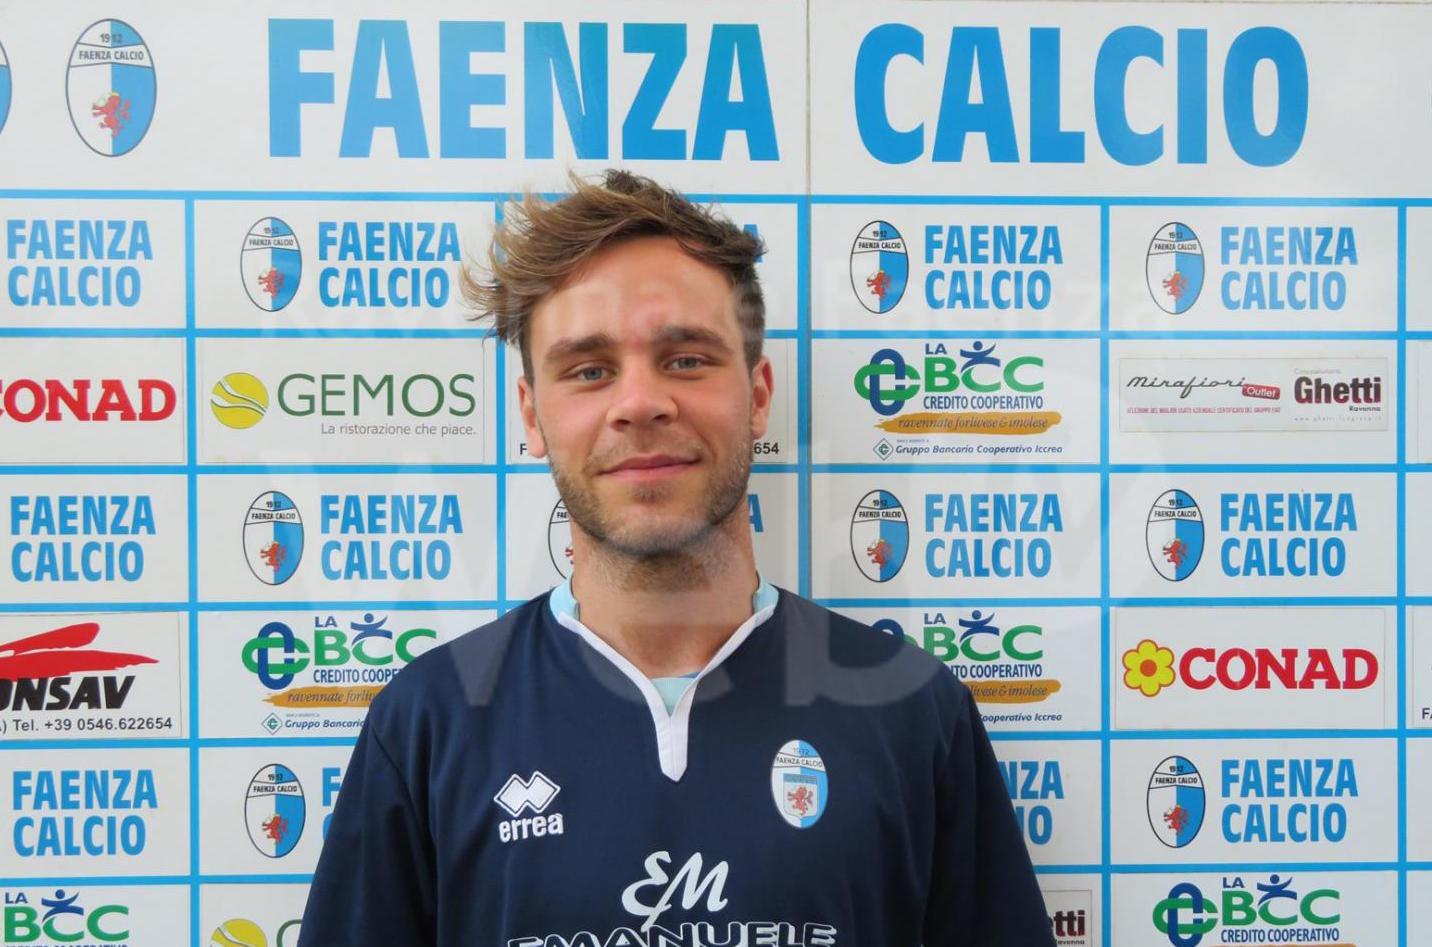 Calcio: La squadra biancoazzurra perde 2-3 in casa con il Bagnacavallo concedendo due contropiedi - Ravennawebtv.it